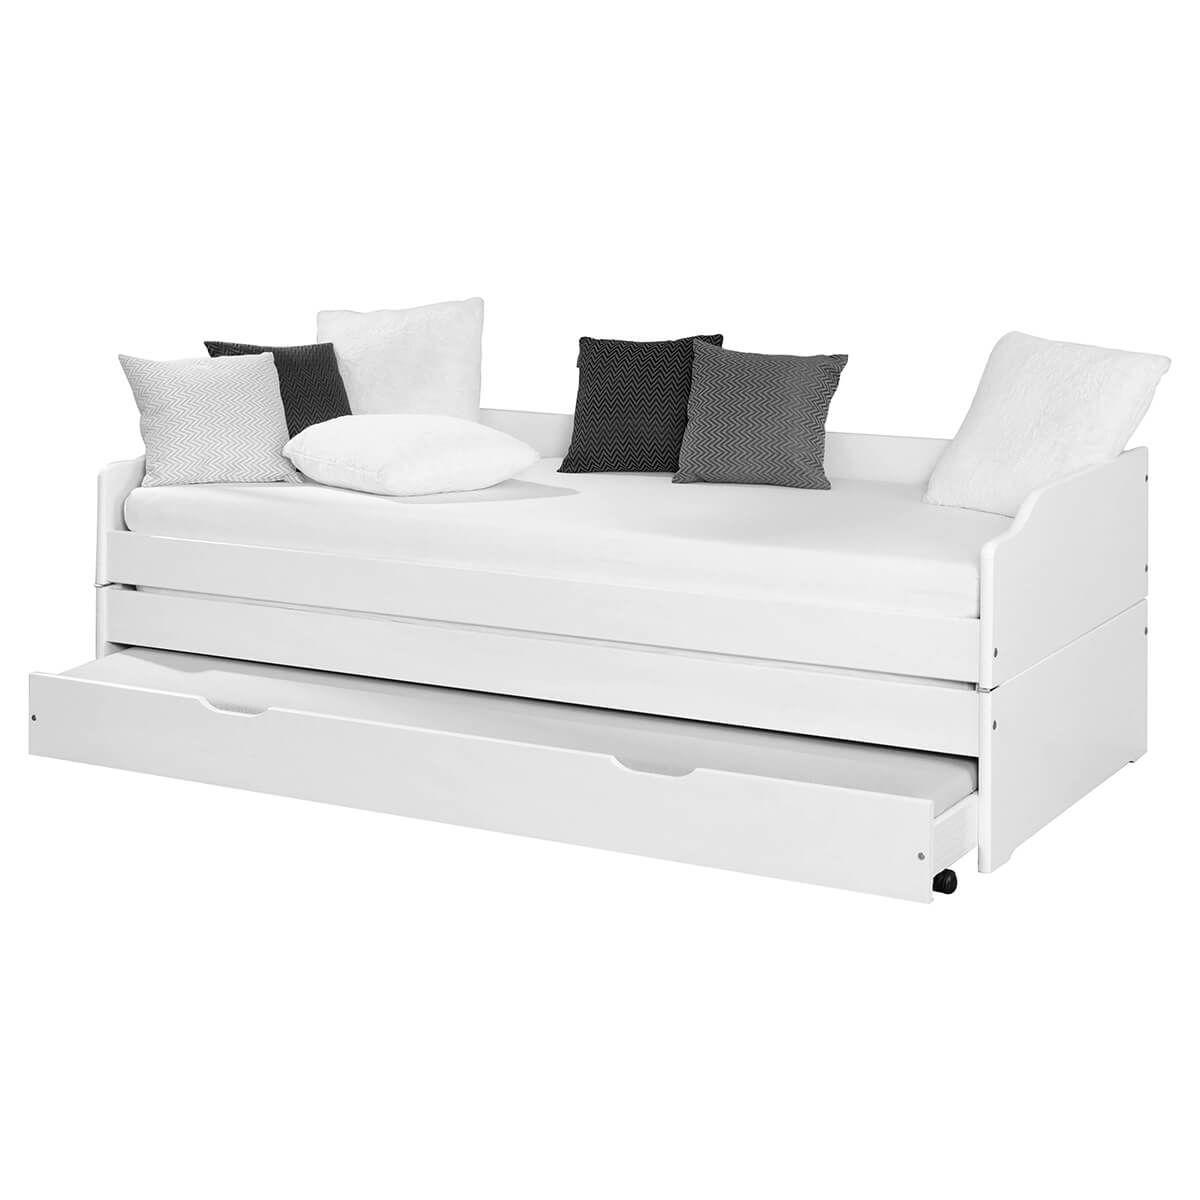 Altobuy Lit  80x190 cm multifonction vernis blanc